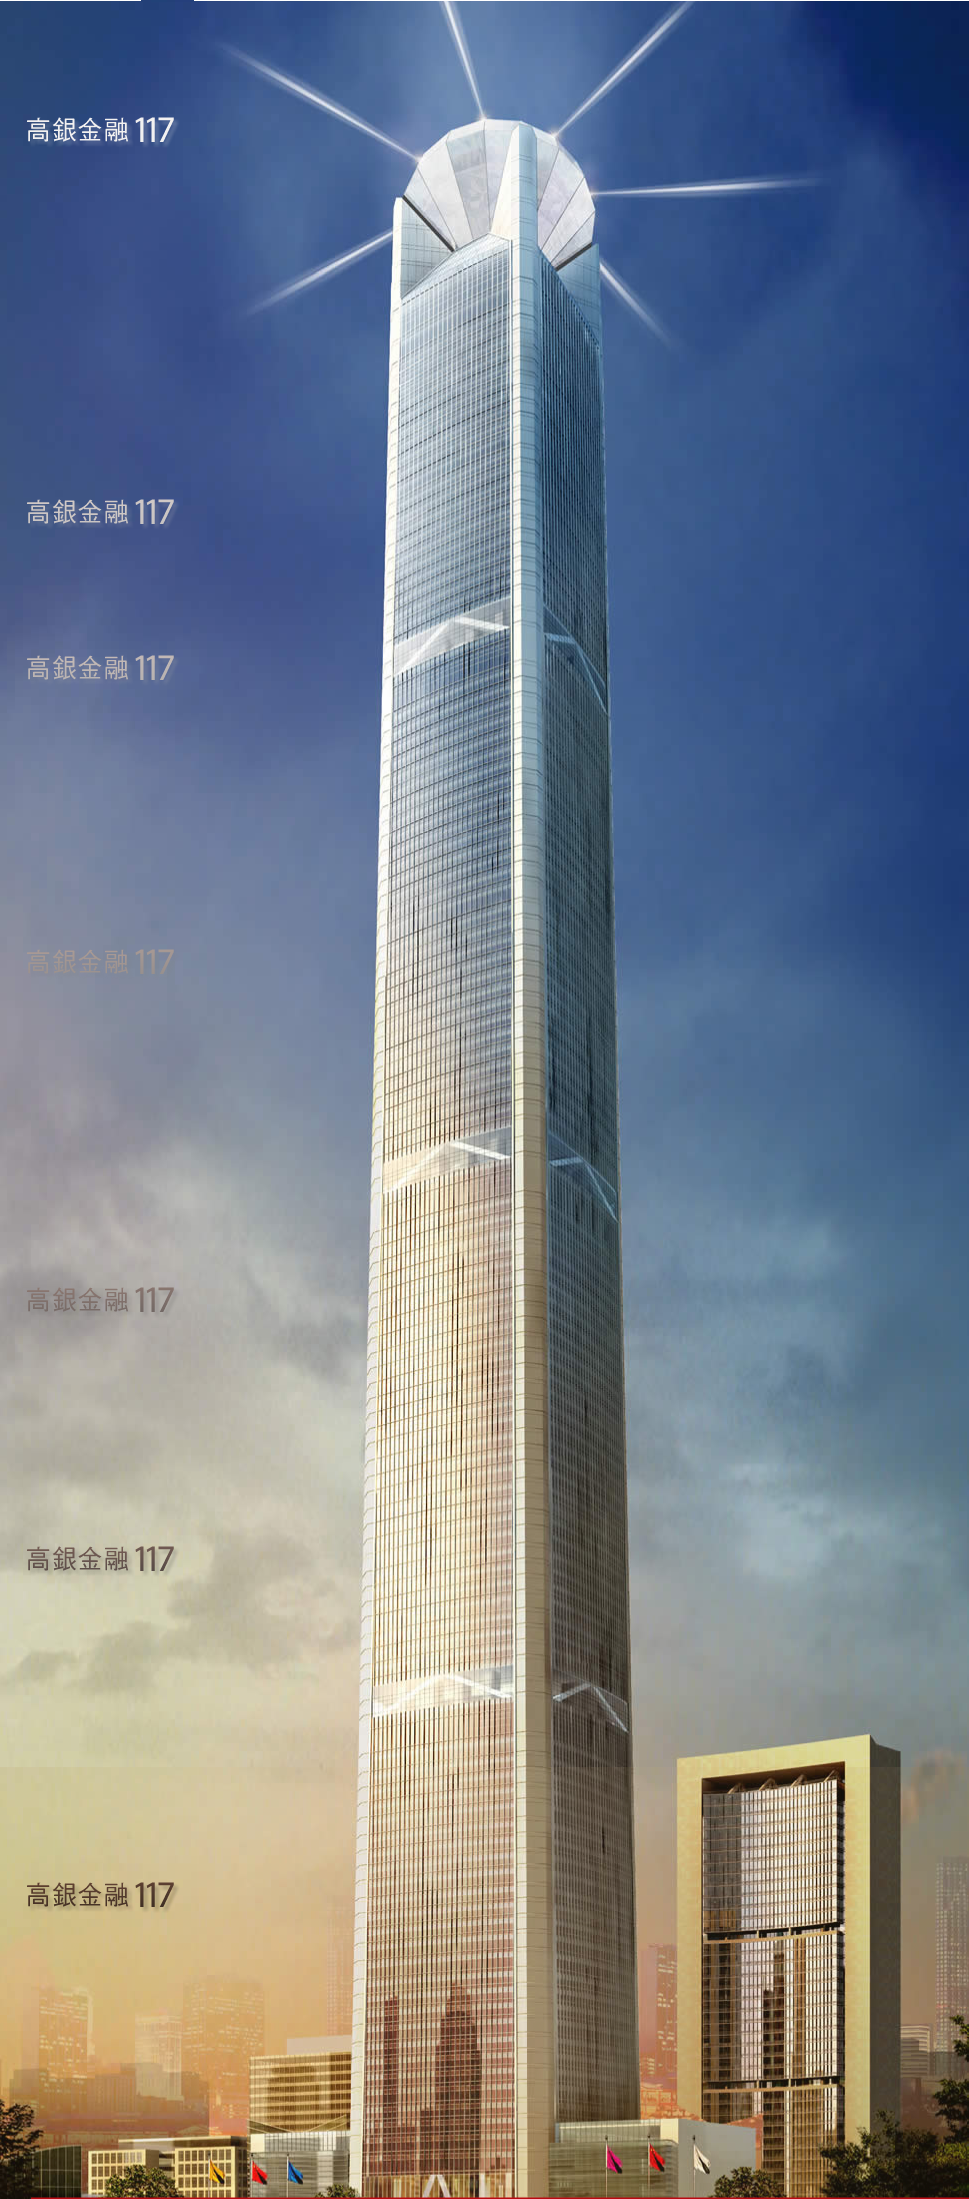 Goldin Finance 117 Tianjin, China, 2014. 117 plantas, 597 m